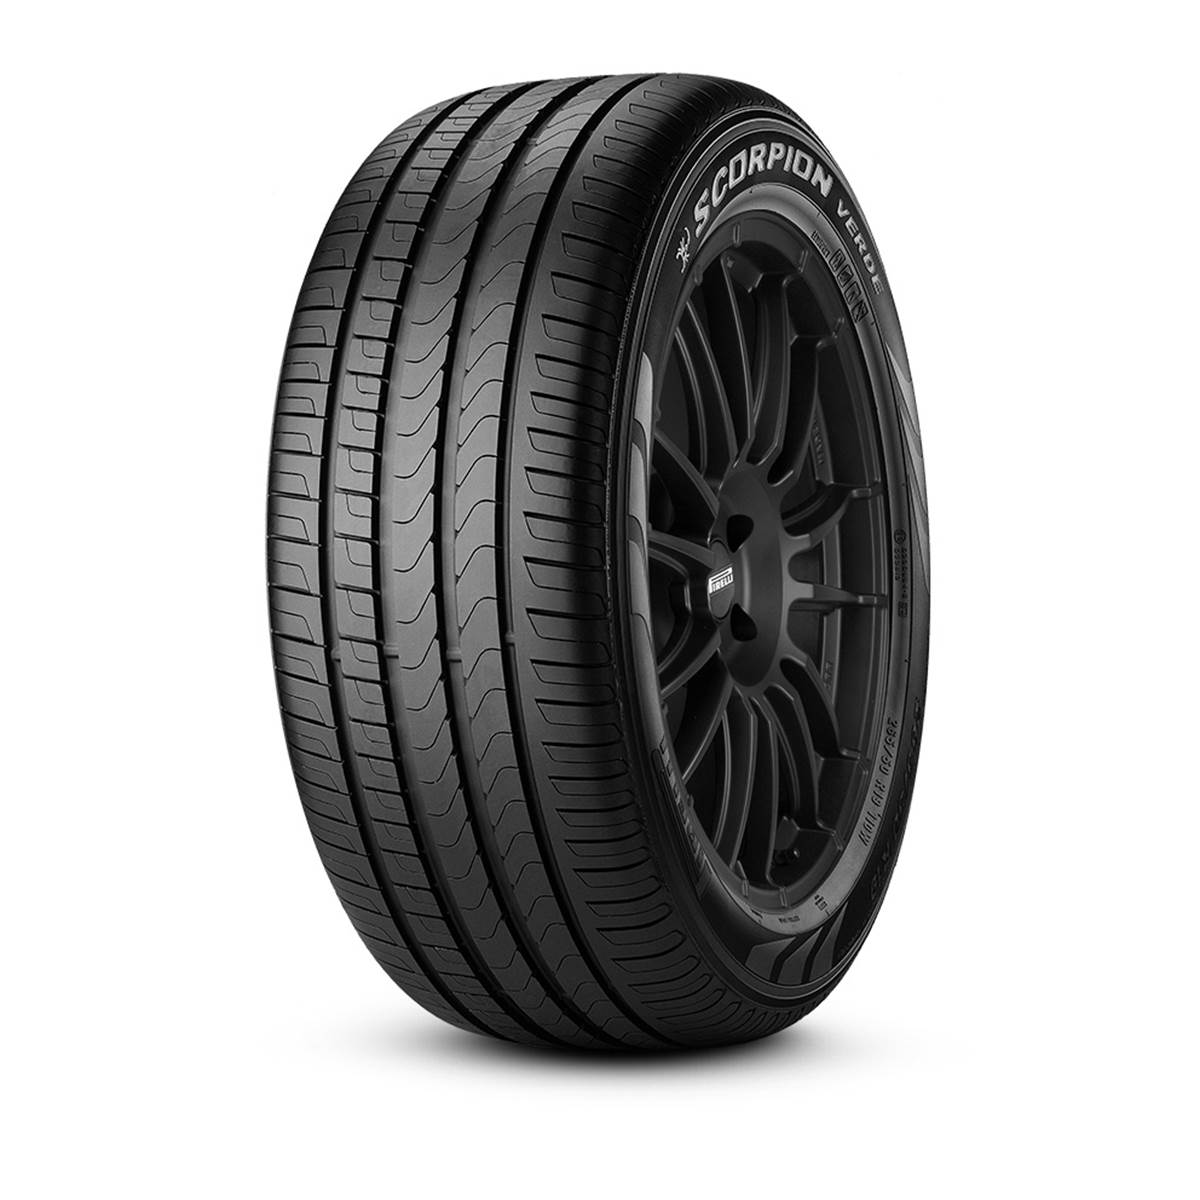 Pirelli Scorpion Verde Homologue Audi Xl